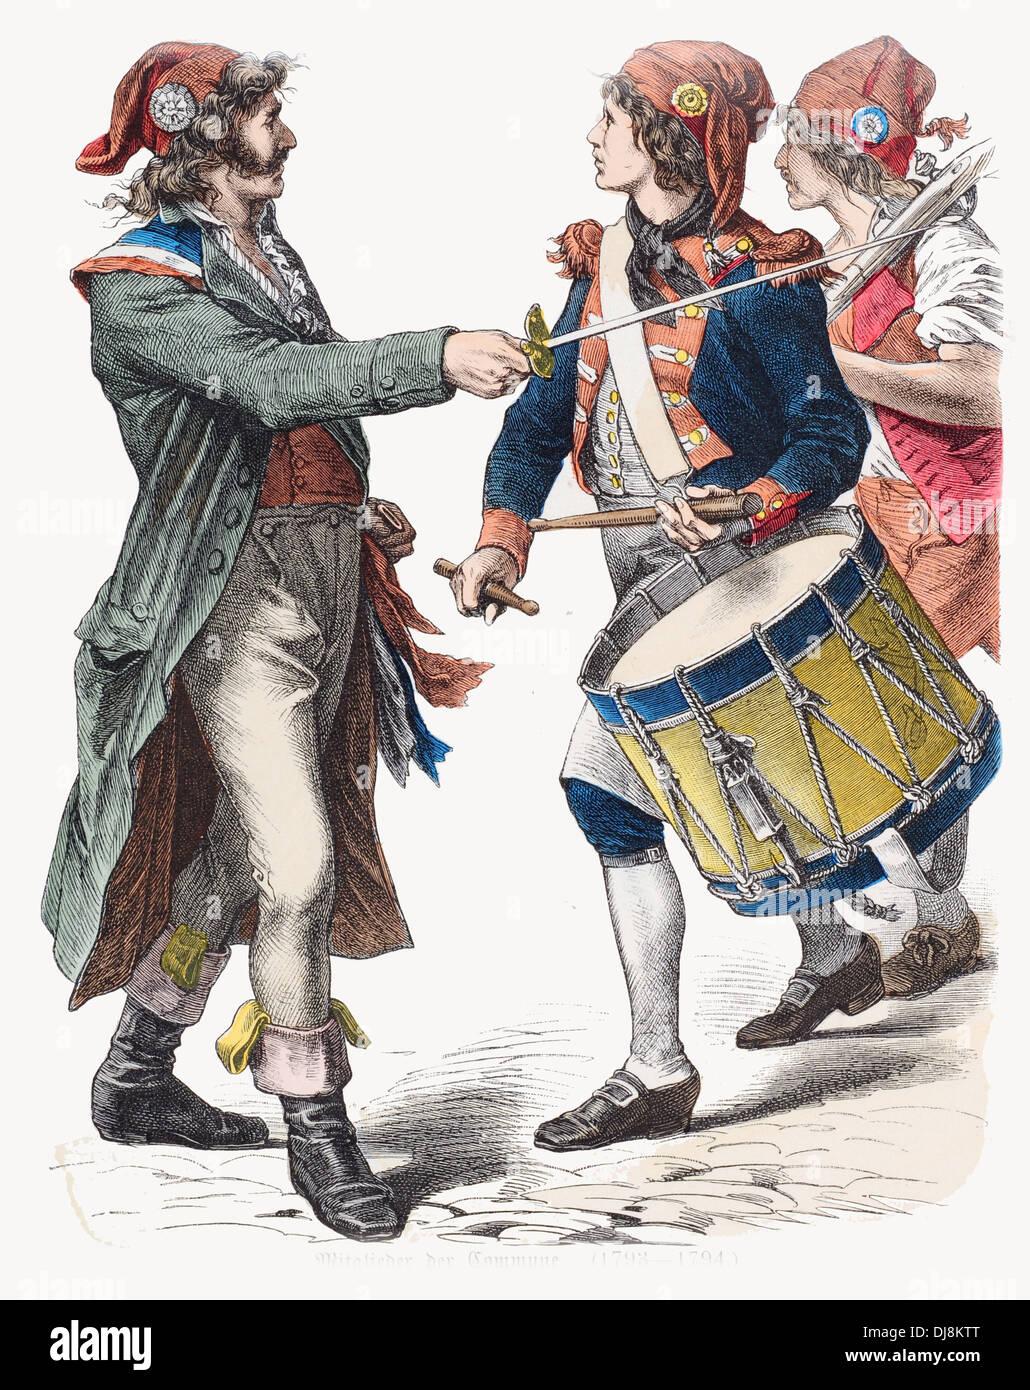 Late 18th century XVIII French Revolution Paris members of the Commune - Stock Image